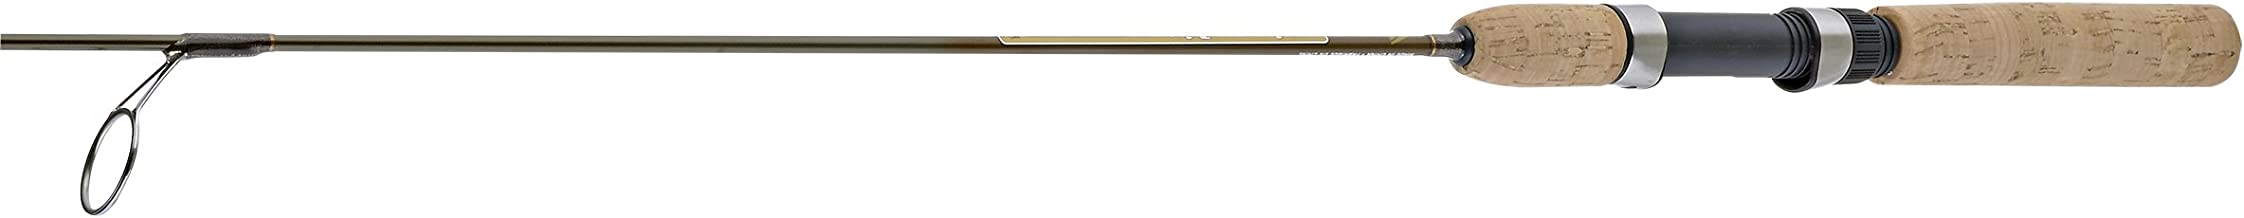 South Bend Microlite S Class Rod